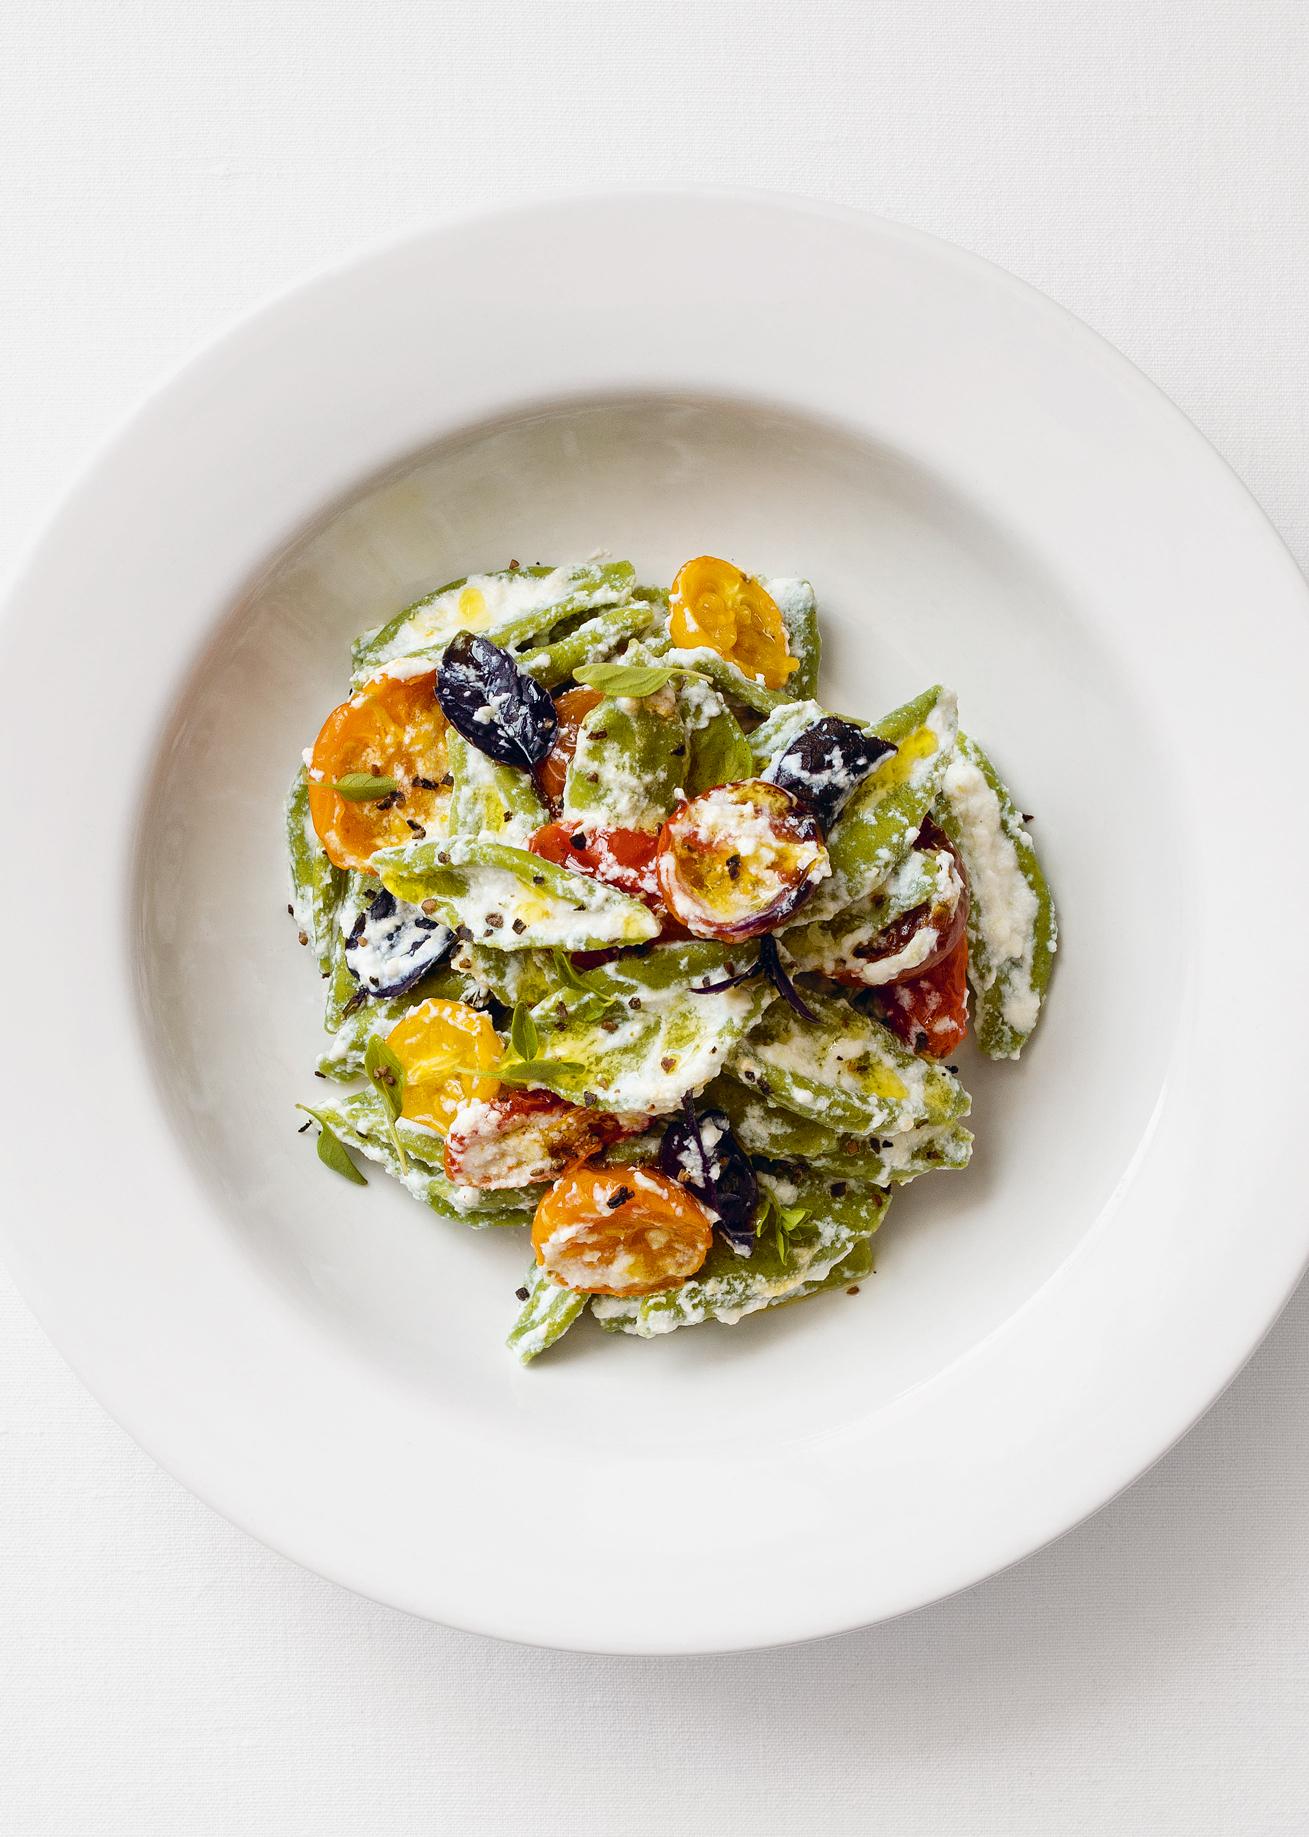 Fotografie Catherine Pearson Kochbuch Pasta